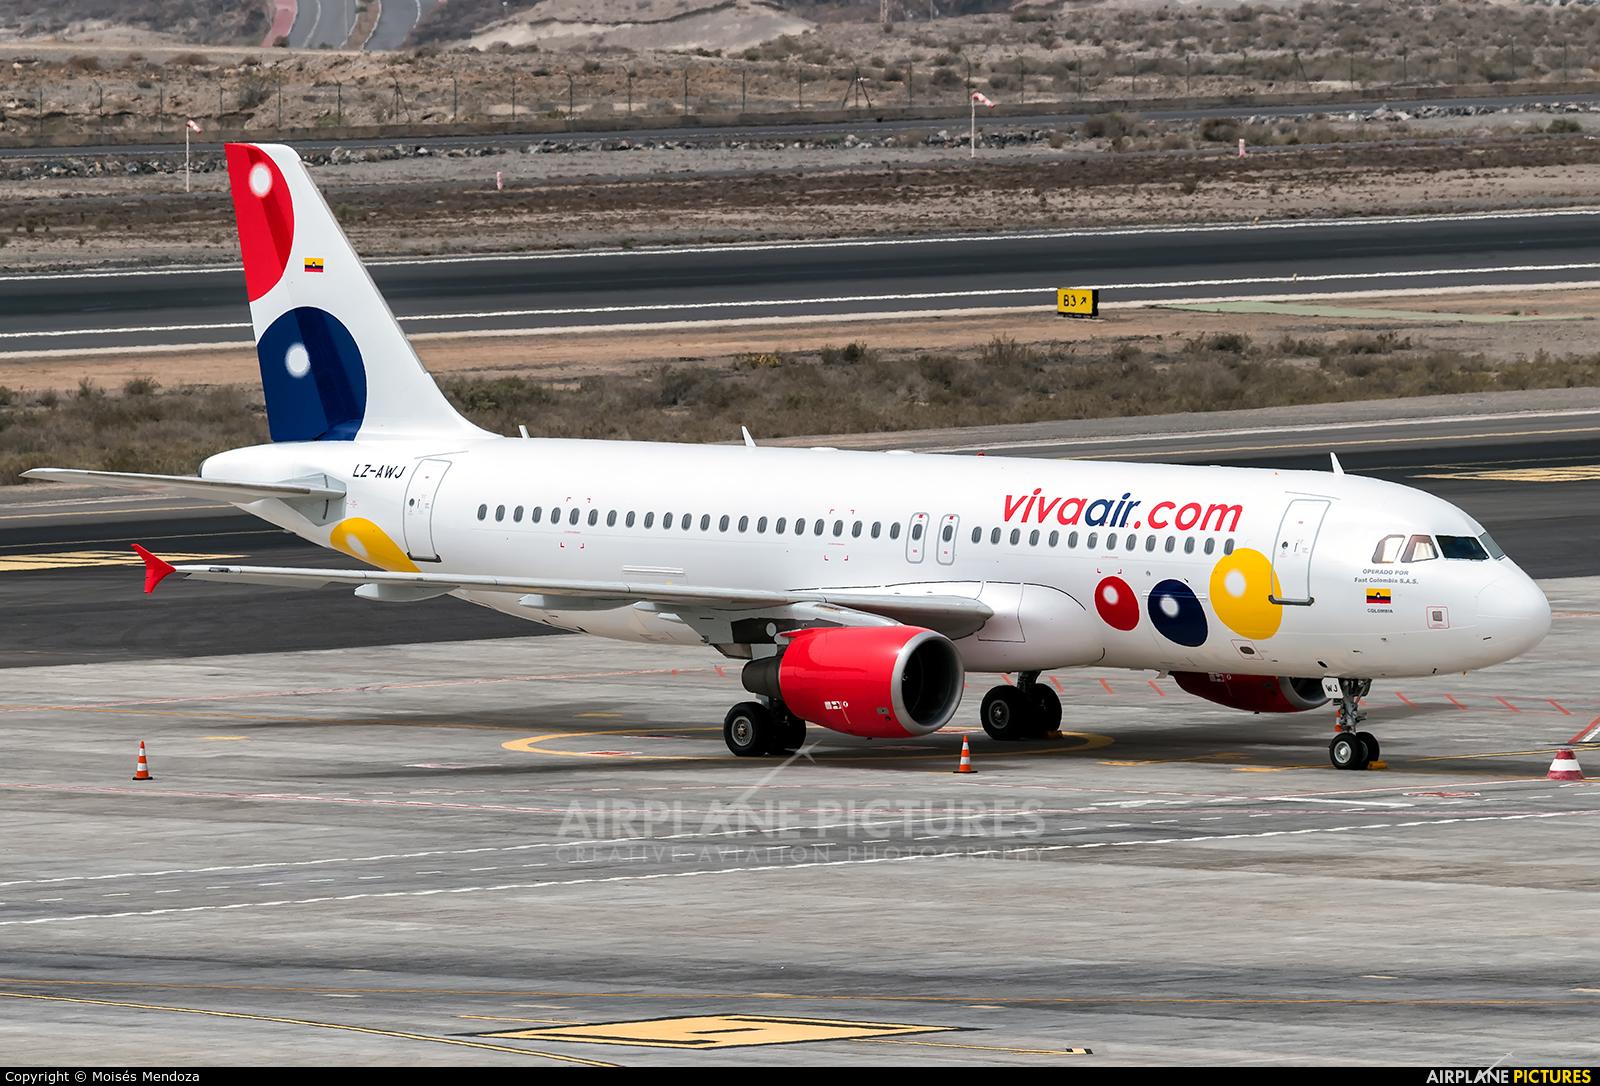 Viva Colombia LZ-AWJ aircraft at Tenerife Sur - Reina Sofia